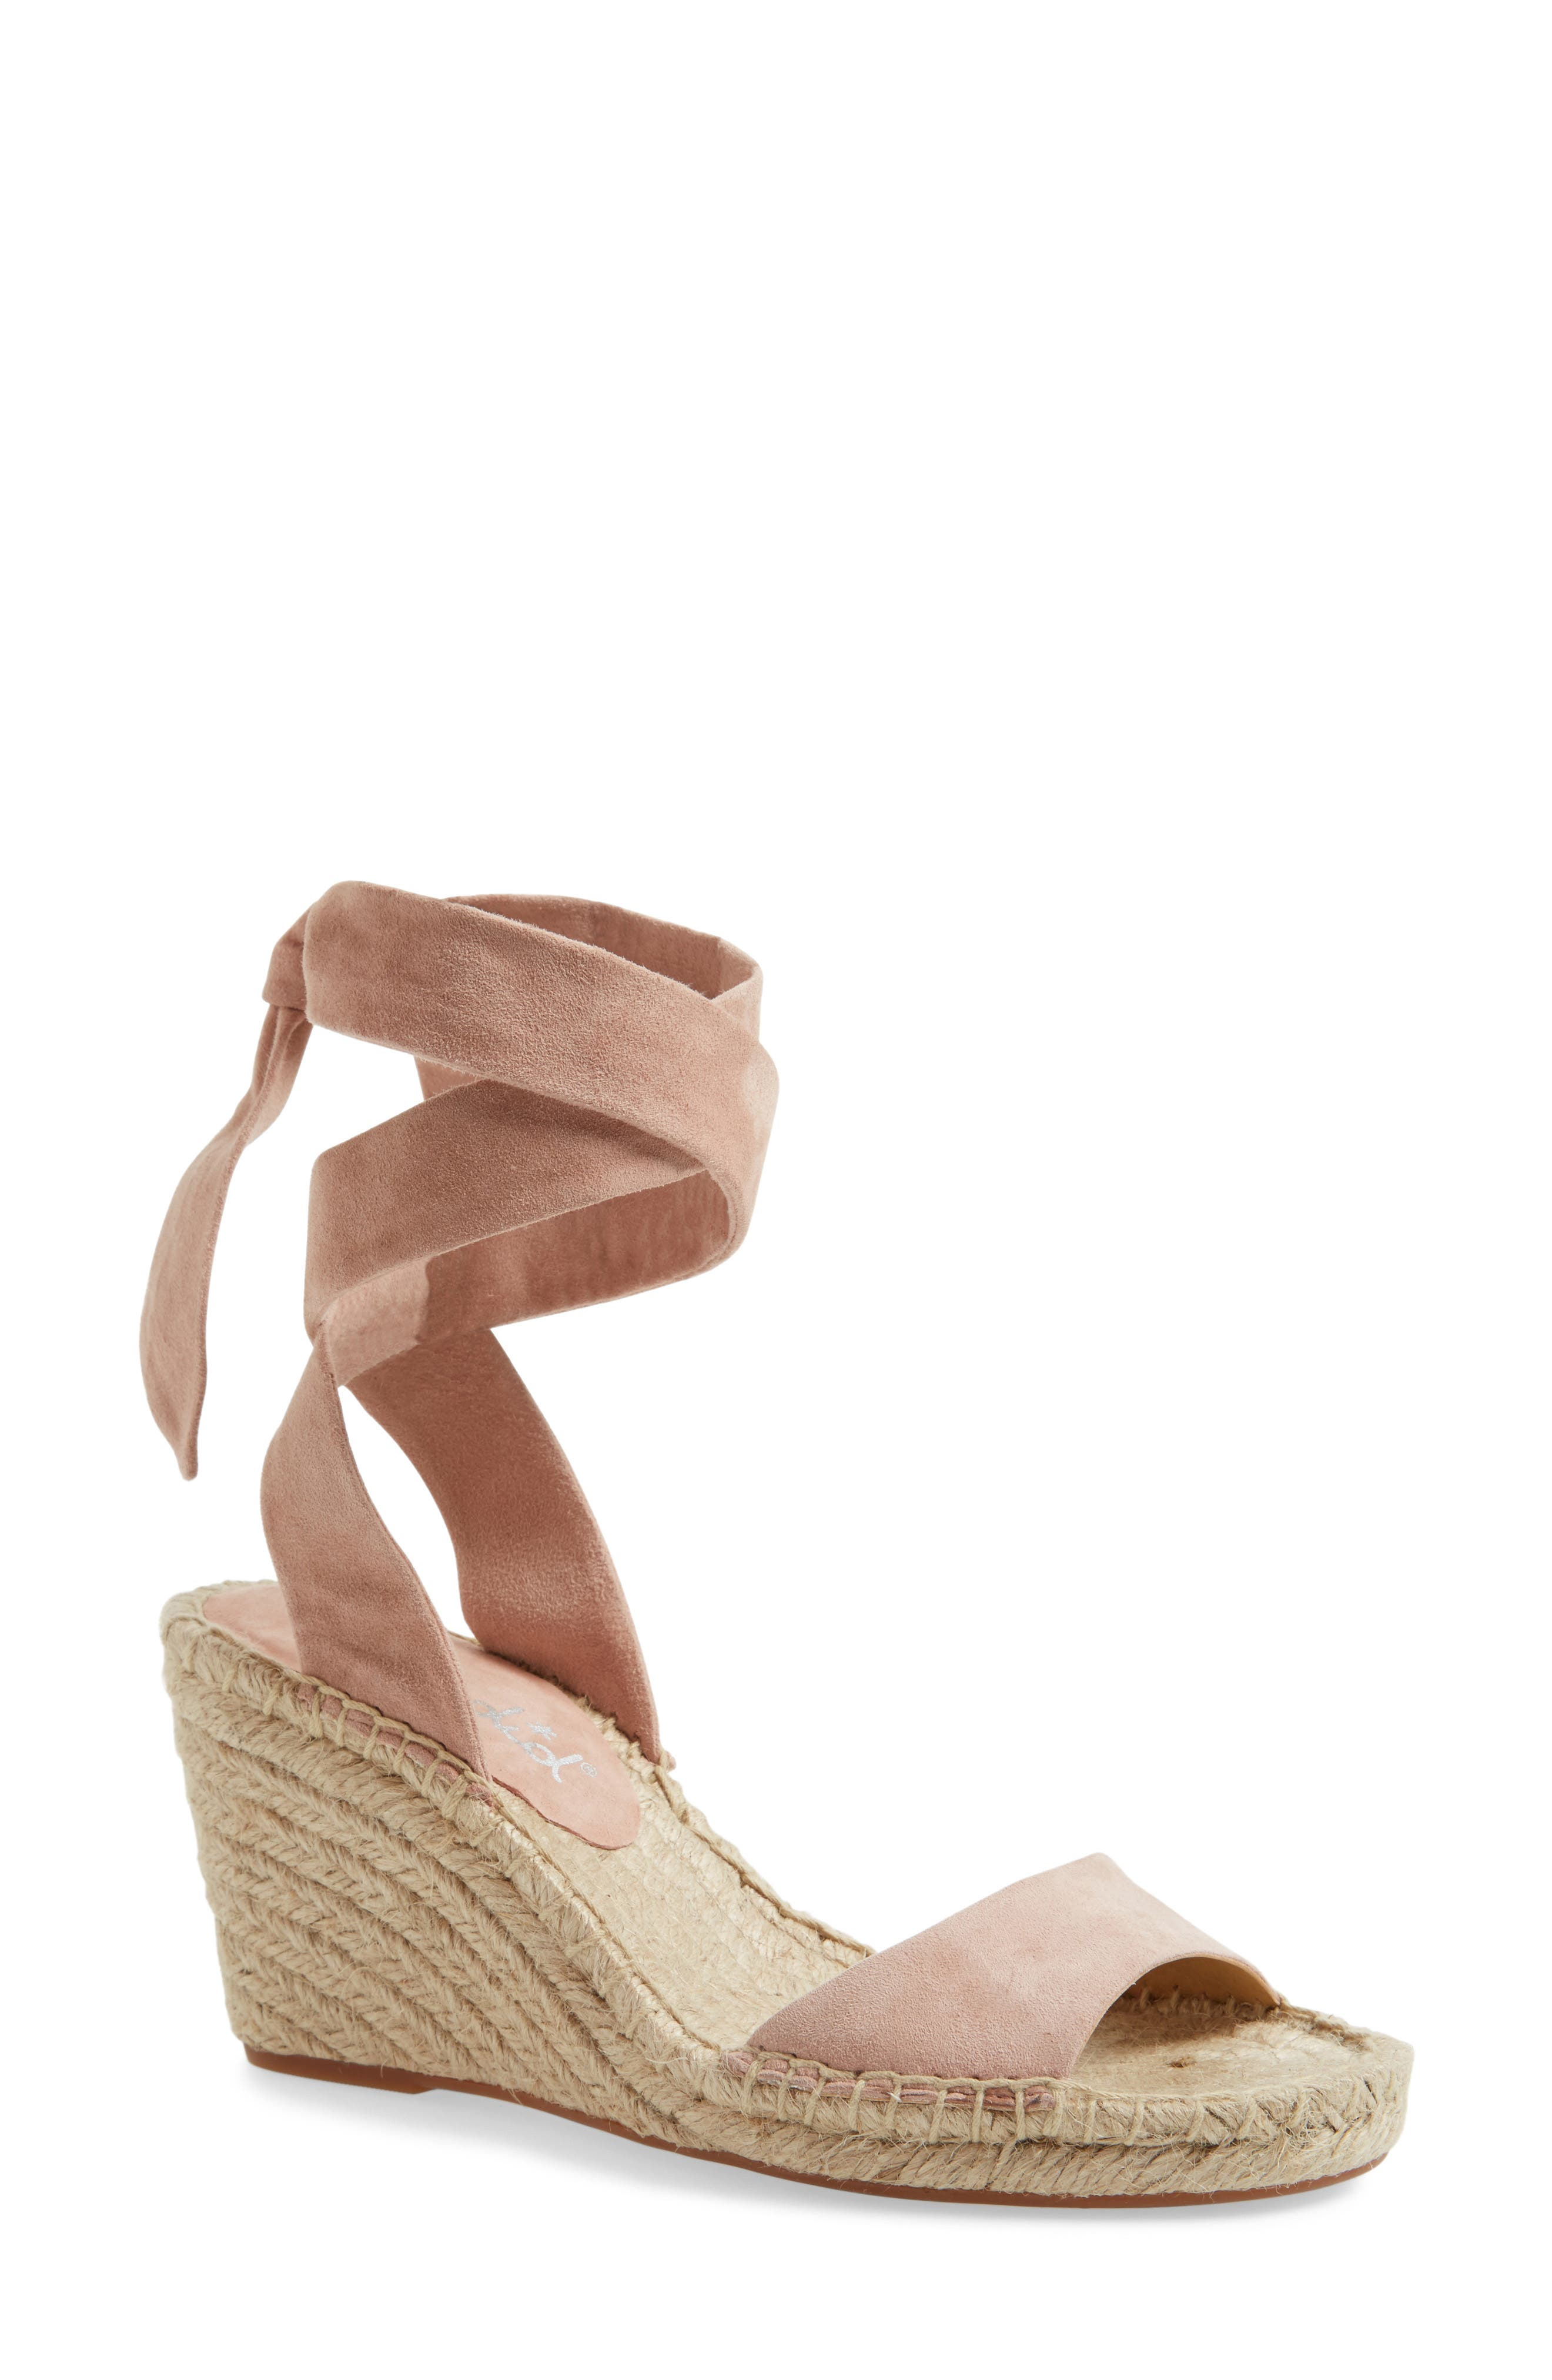 Alternate Image 1 Selected - Splendid Joelle Ankle Tie Espadrille (Women)